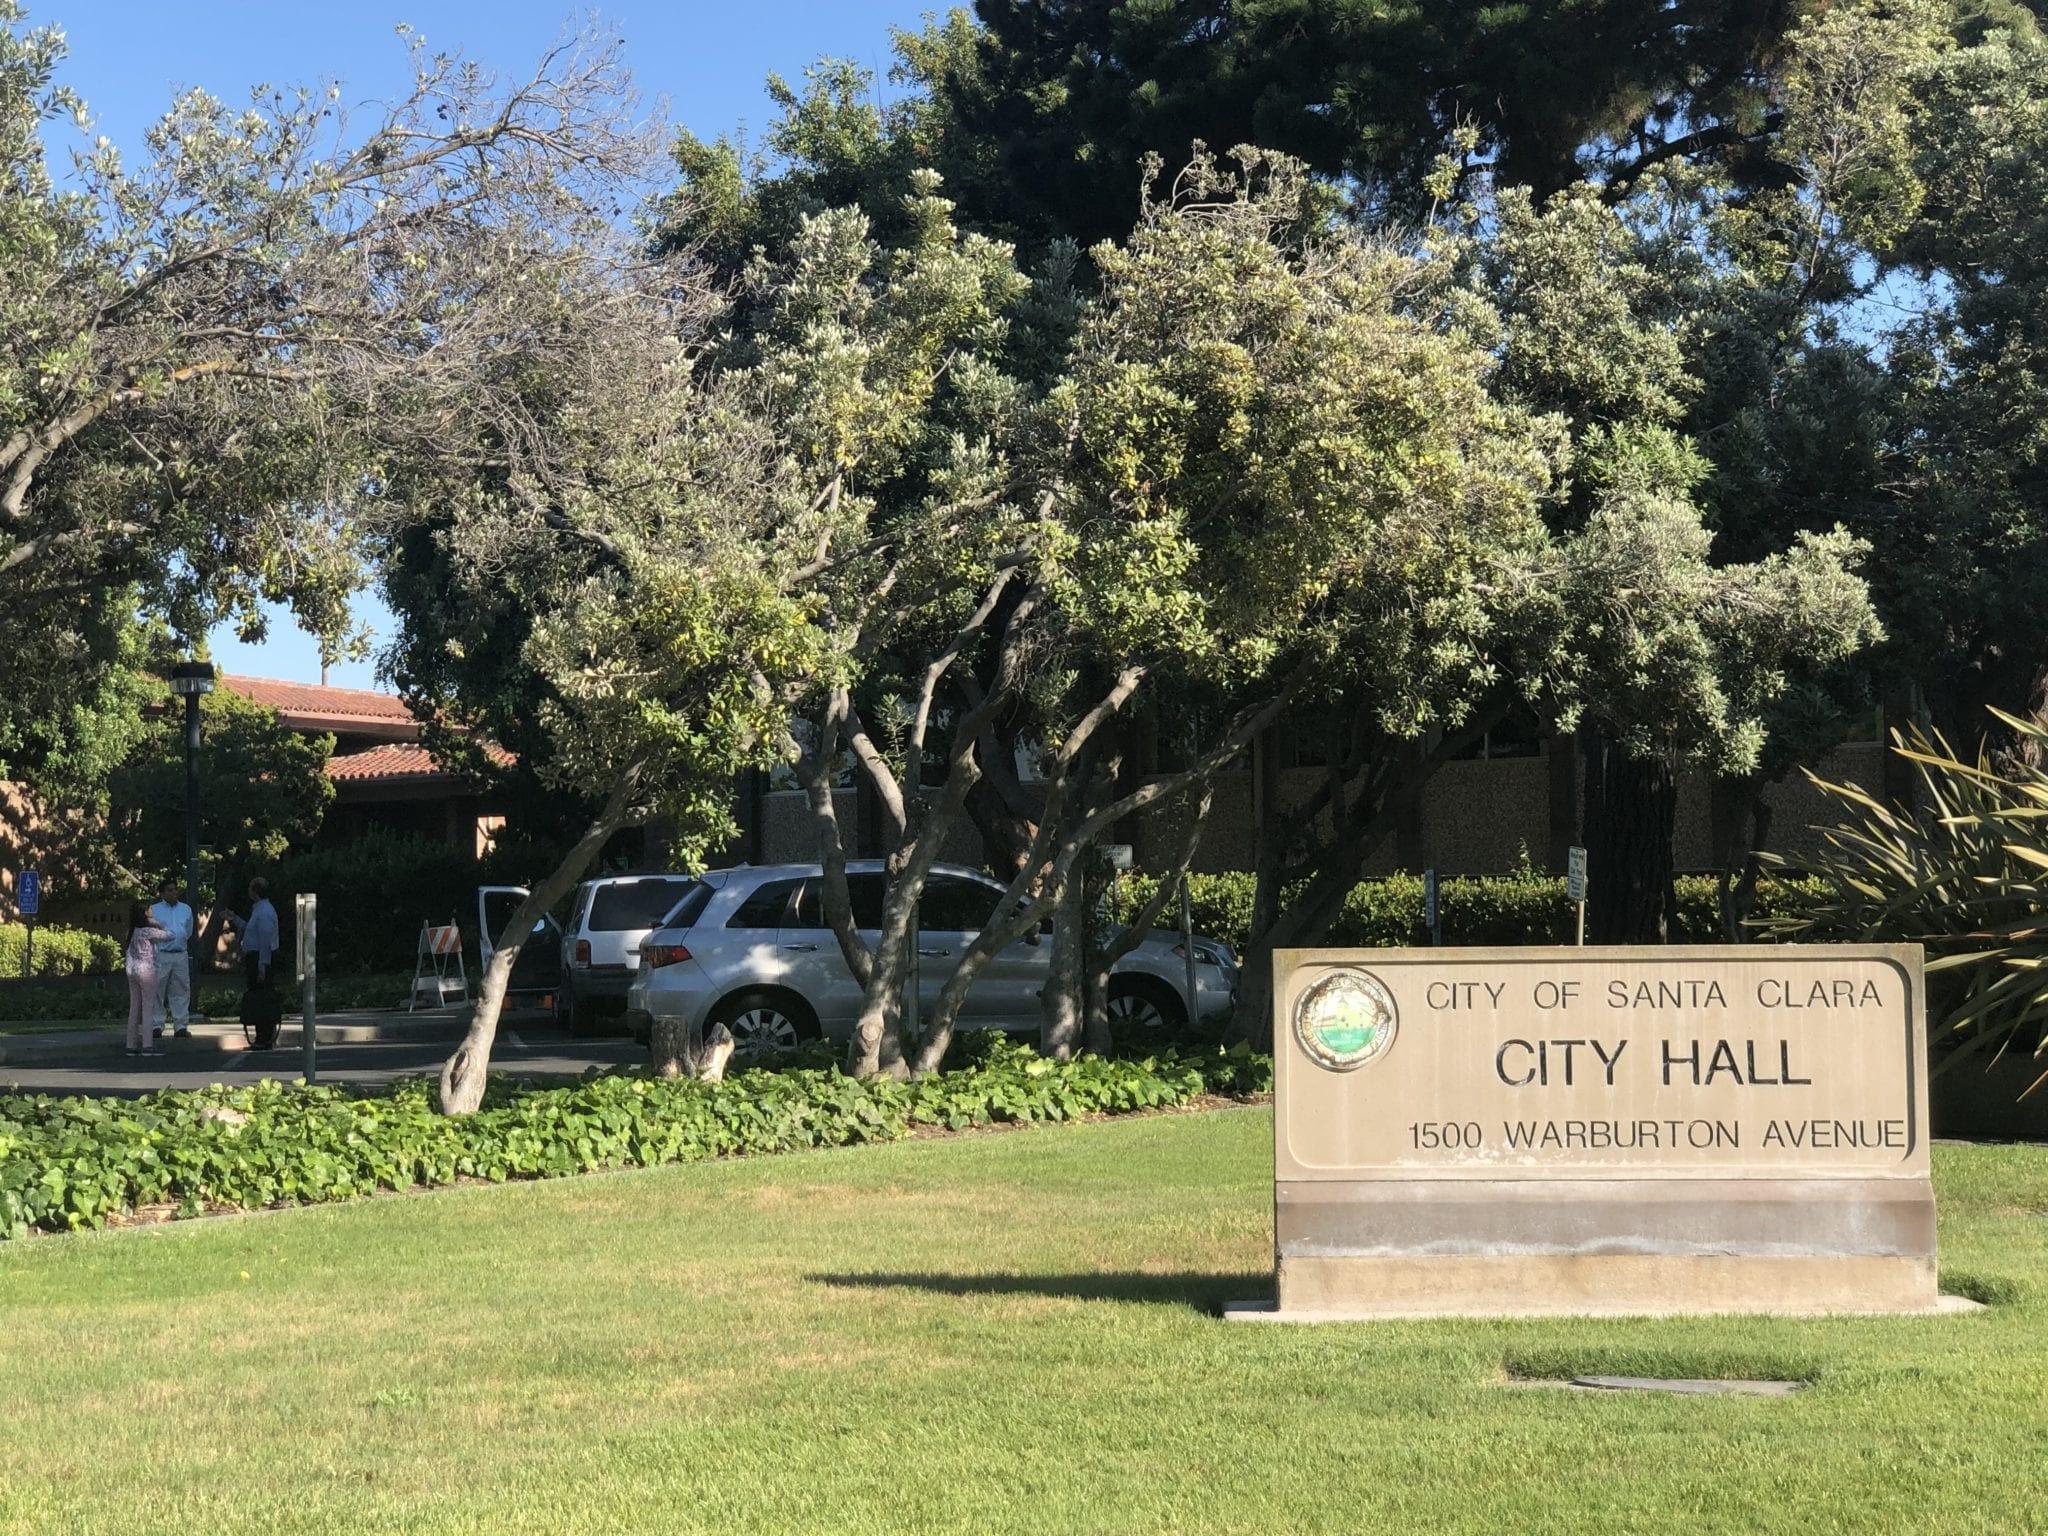 Will a $300K consultant fix Santa Clara's tourism woes? - San José Spotlight